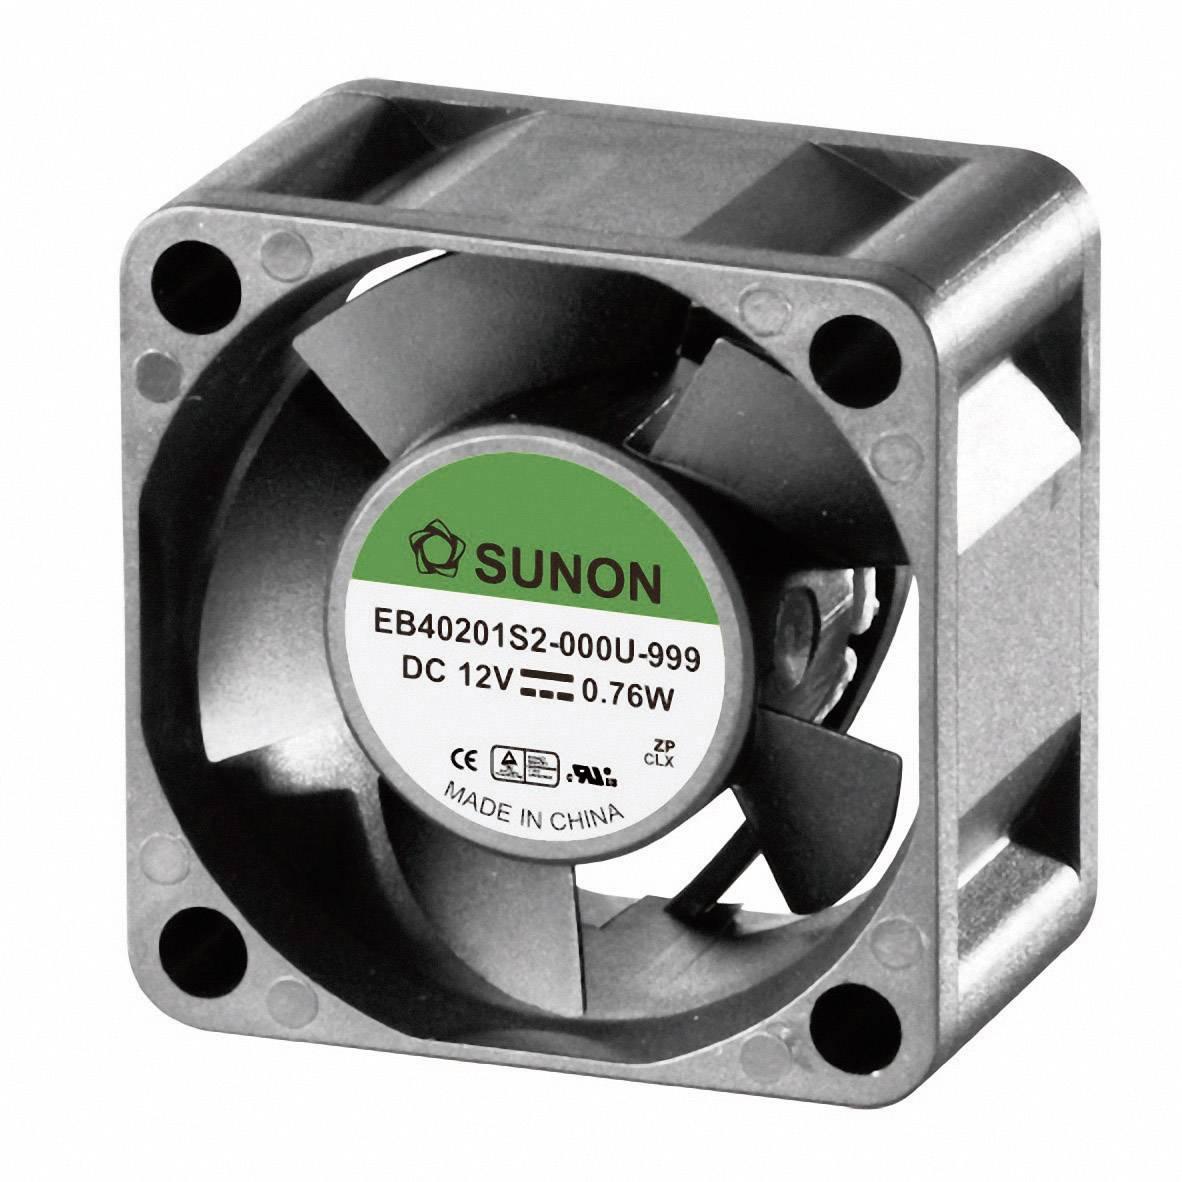 Ventilátor Sunon DR EB40201S2-000U-999, 40 x 40 x 20 mm, 12V/DC